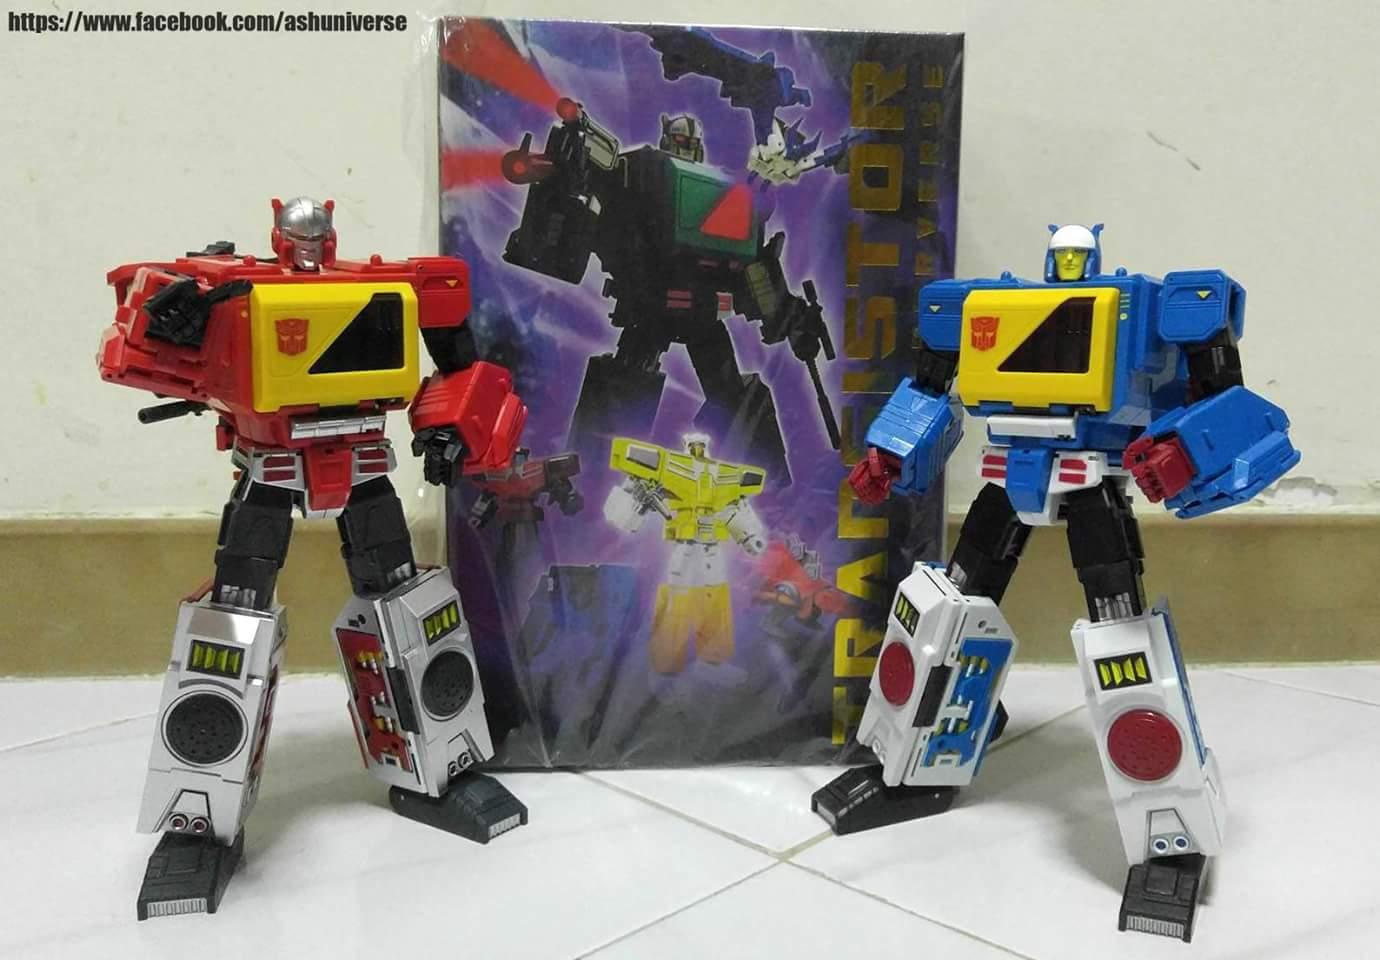 [KFC Toys] Produit Tiers - Jouet Transistor (aka Blaster/Tempo) + DoubleDeck (Twincast) + Fader (aka Eject/Éjecteur) + Rover (aka Autoscout) - Page 2 HOT4hVQK